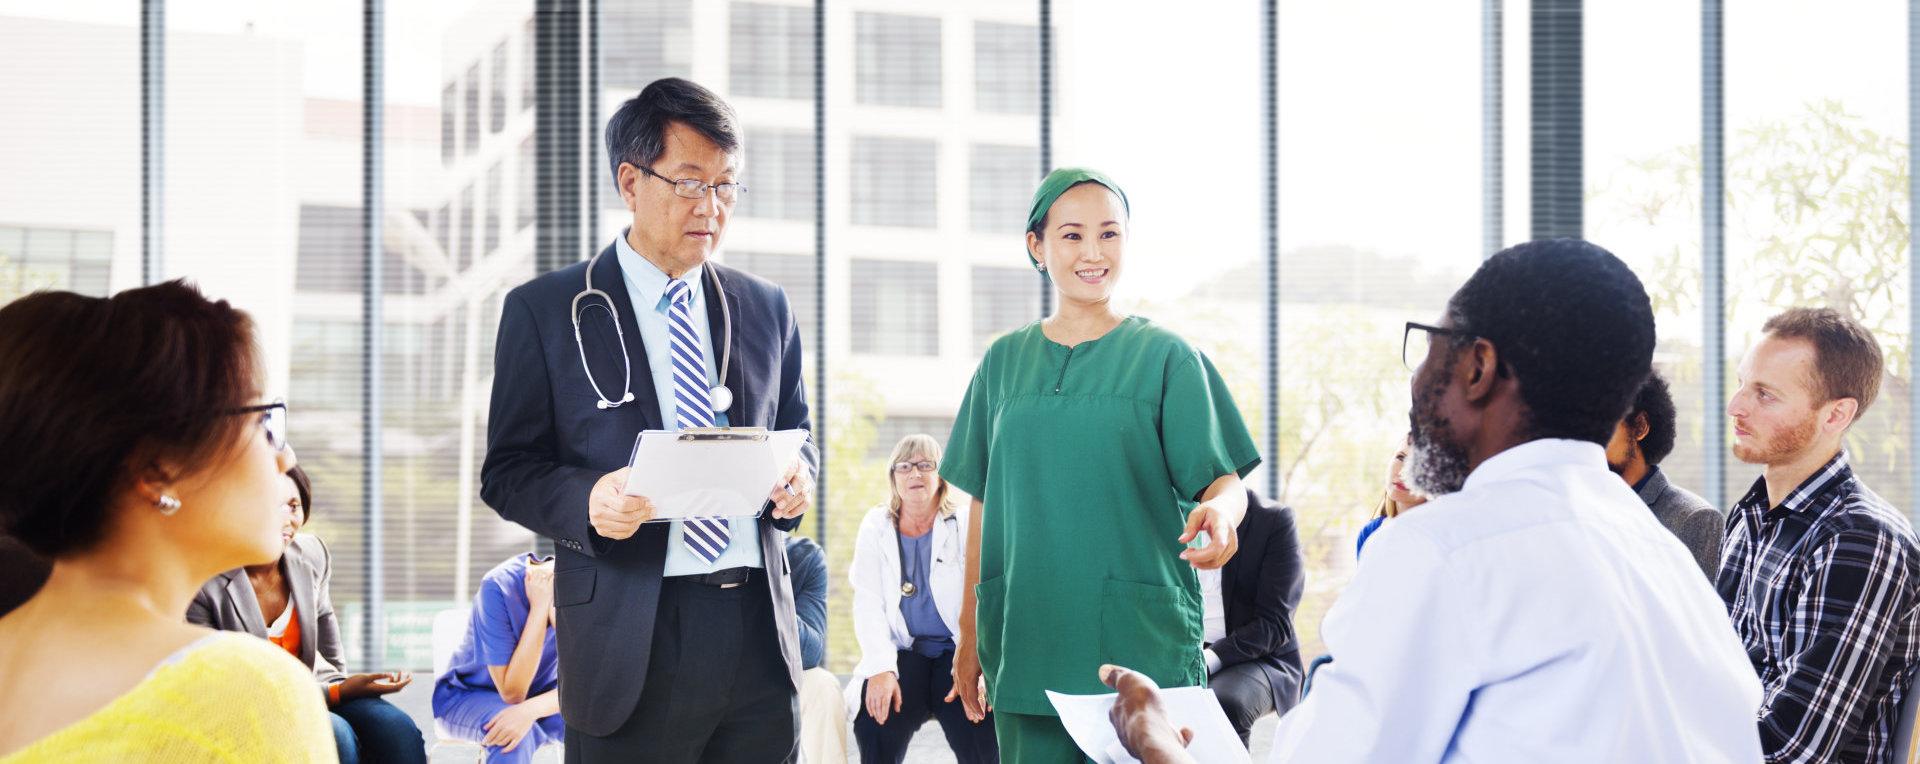 medical doctors having a meeting